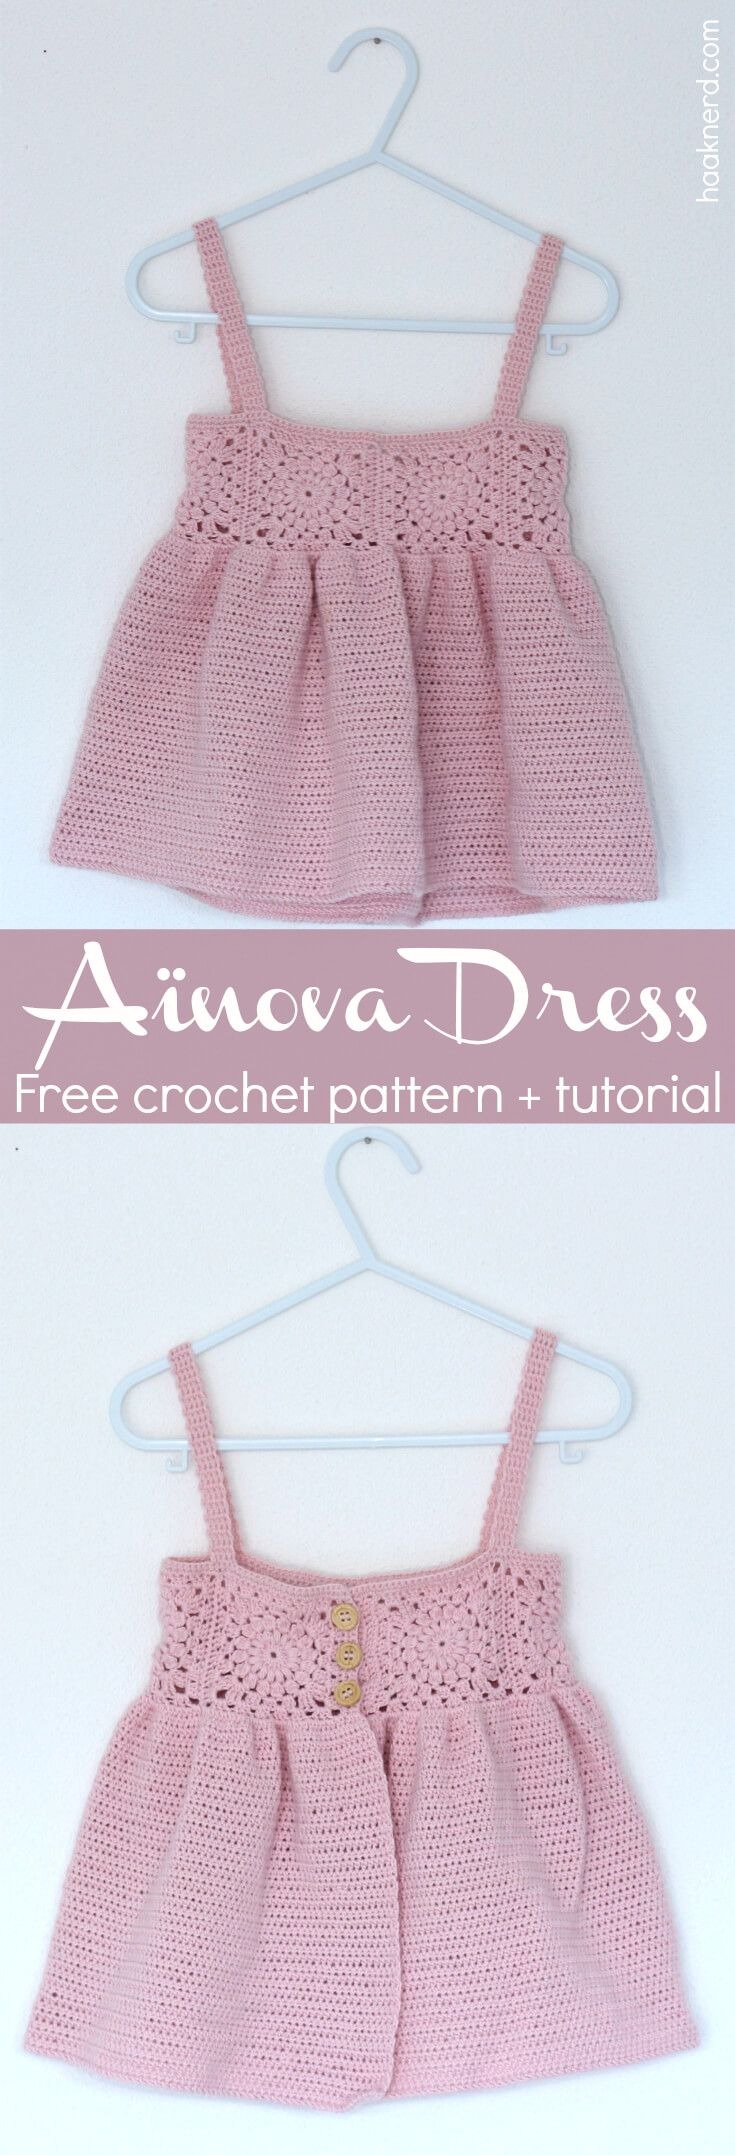 Aïnova Dress - Free crochet pattern with a step-by-step photo tutorial via @haaknerd